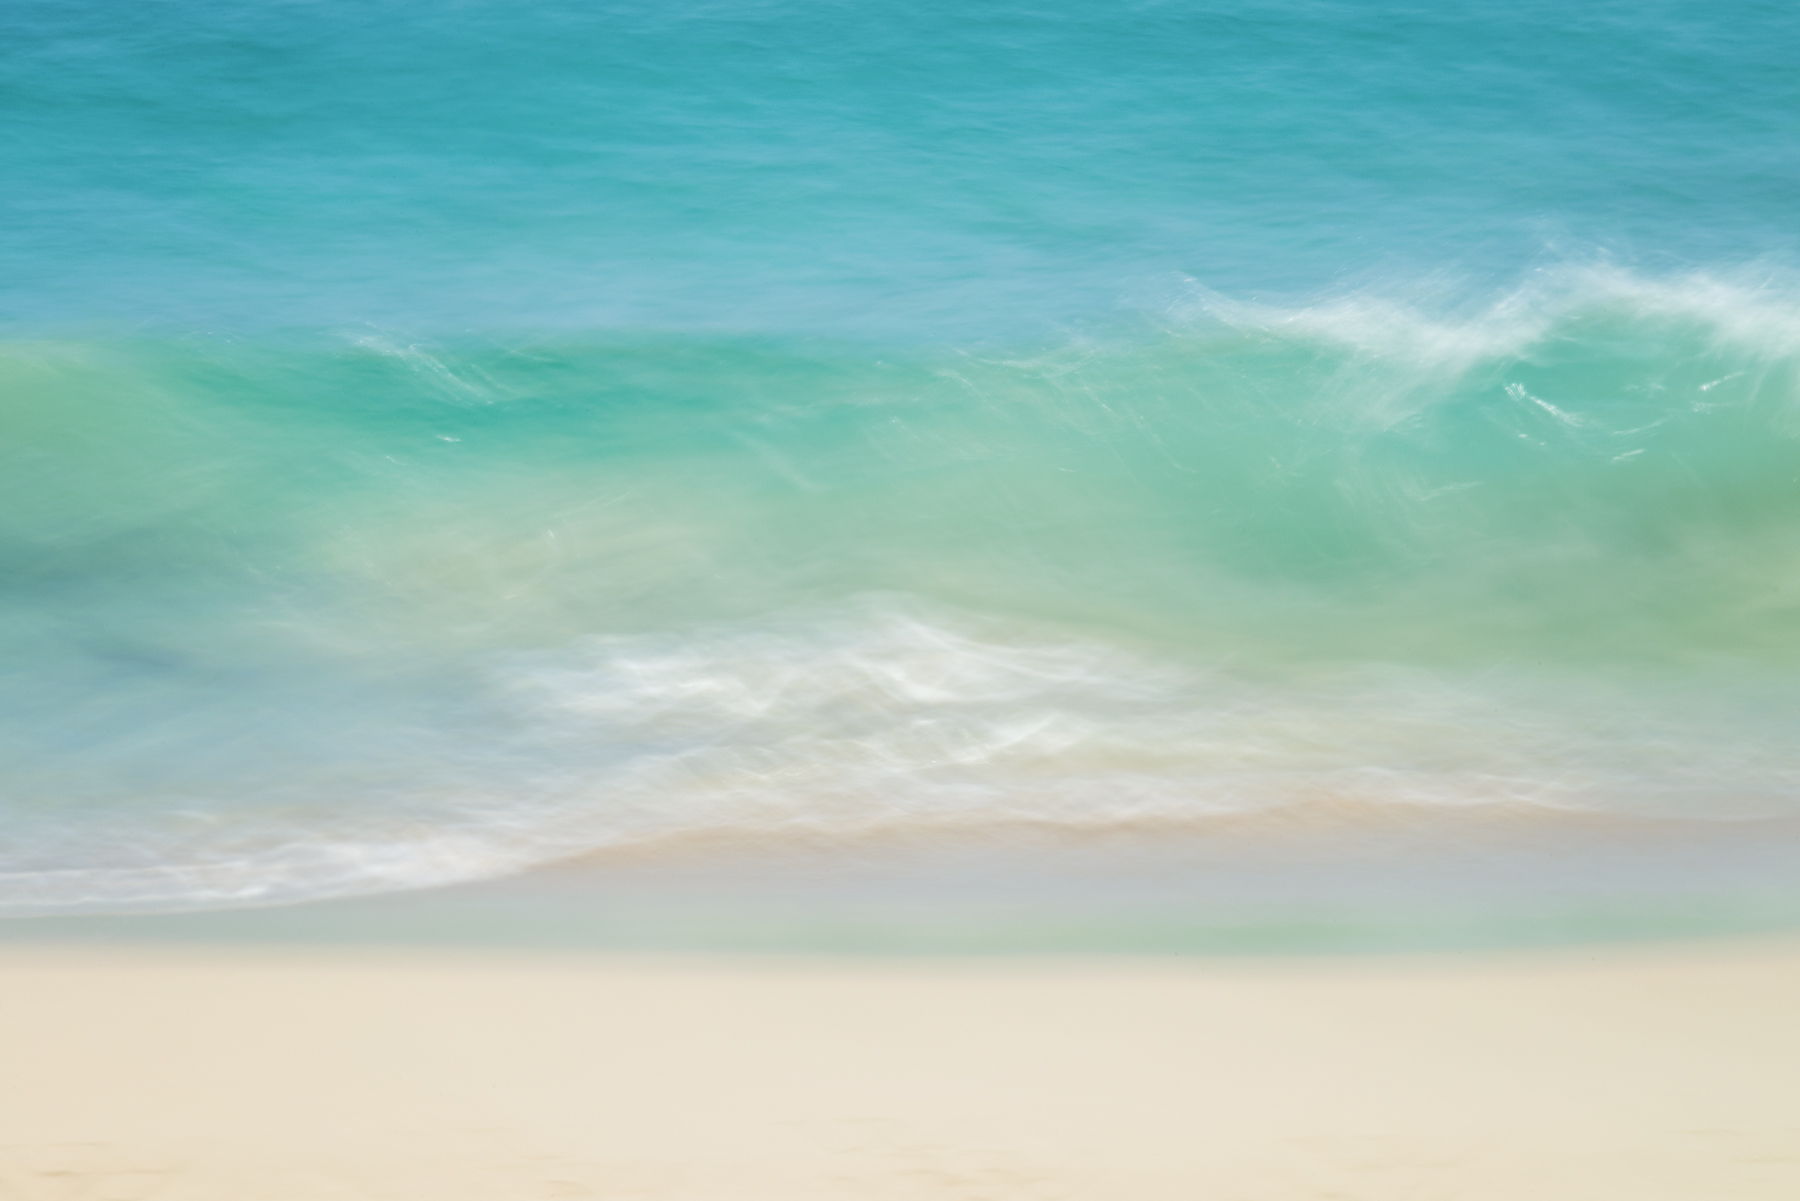 St. Barths Waves 9902